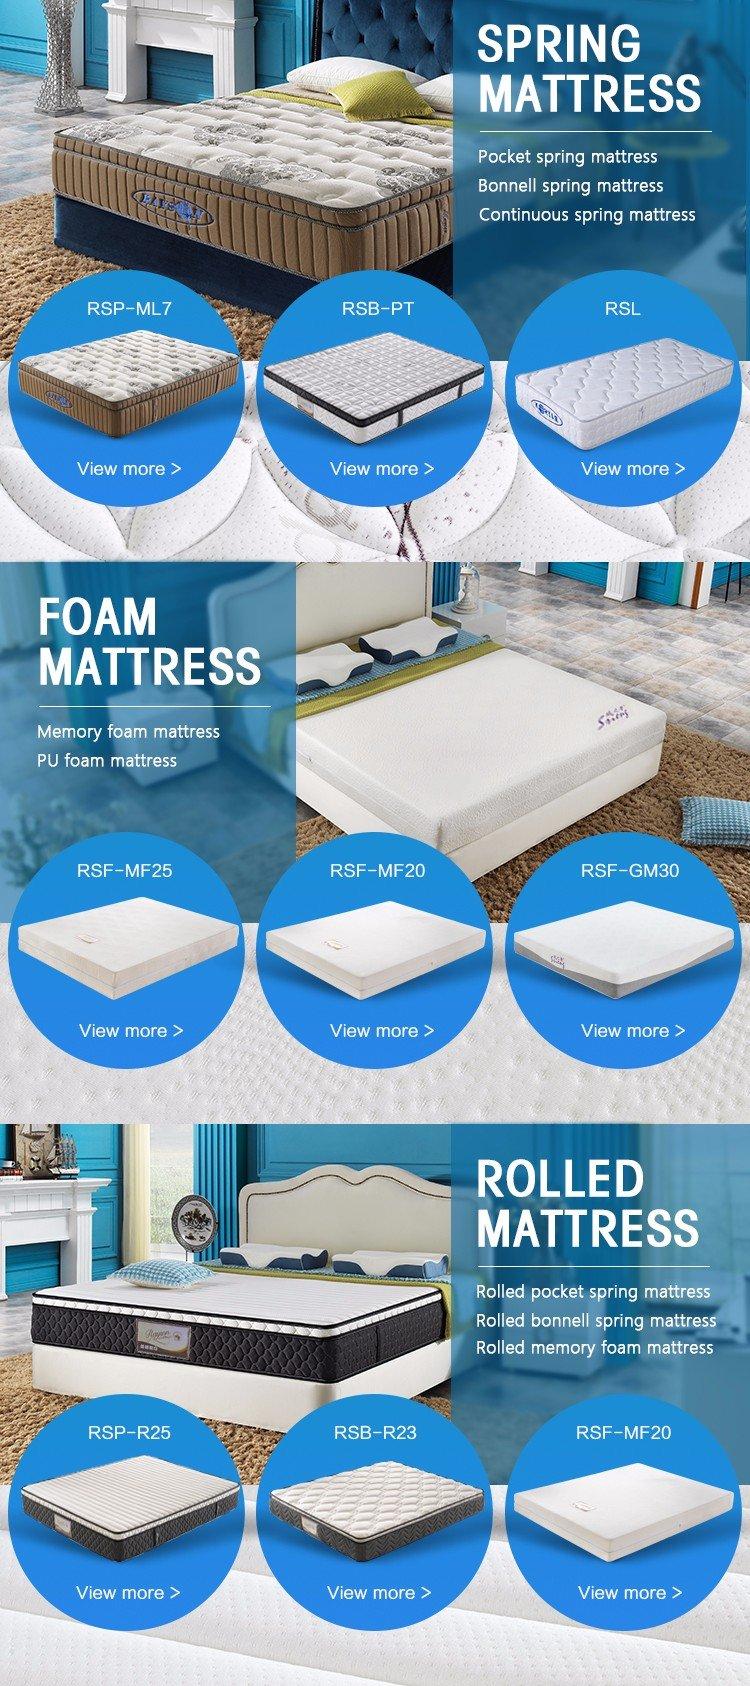 Best 1200 pocket spring mattress high quality Supply-10